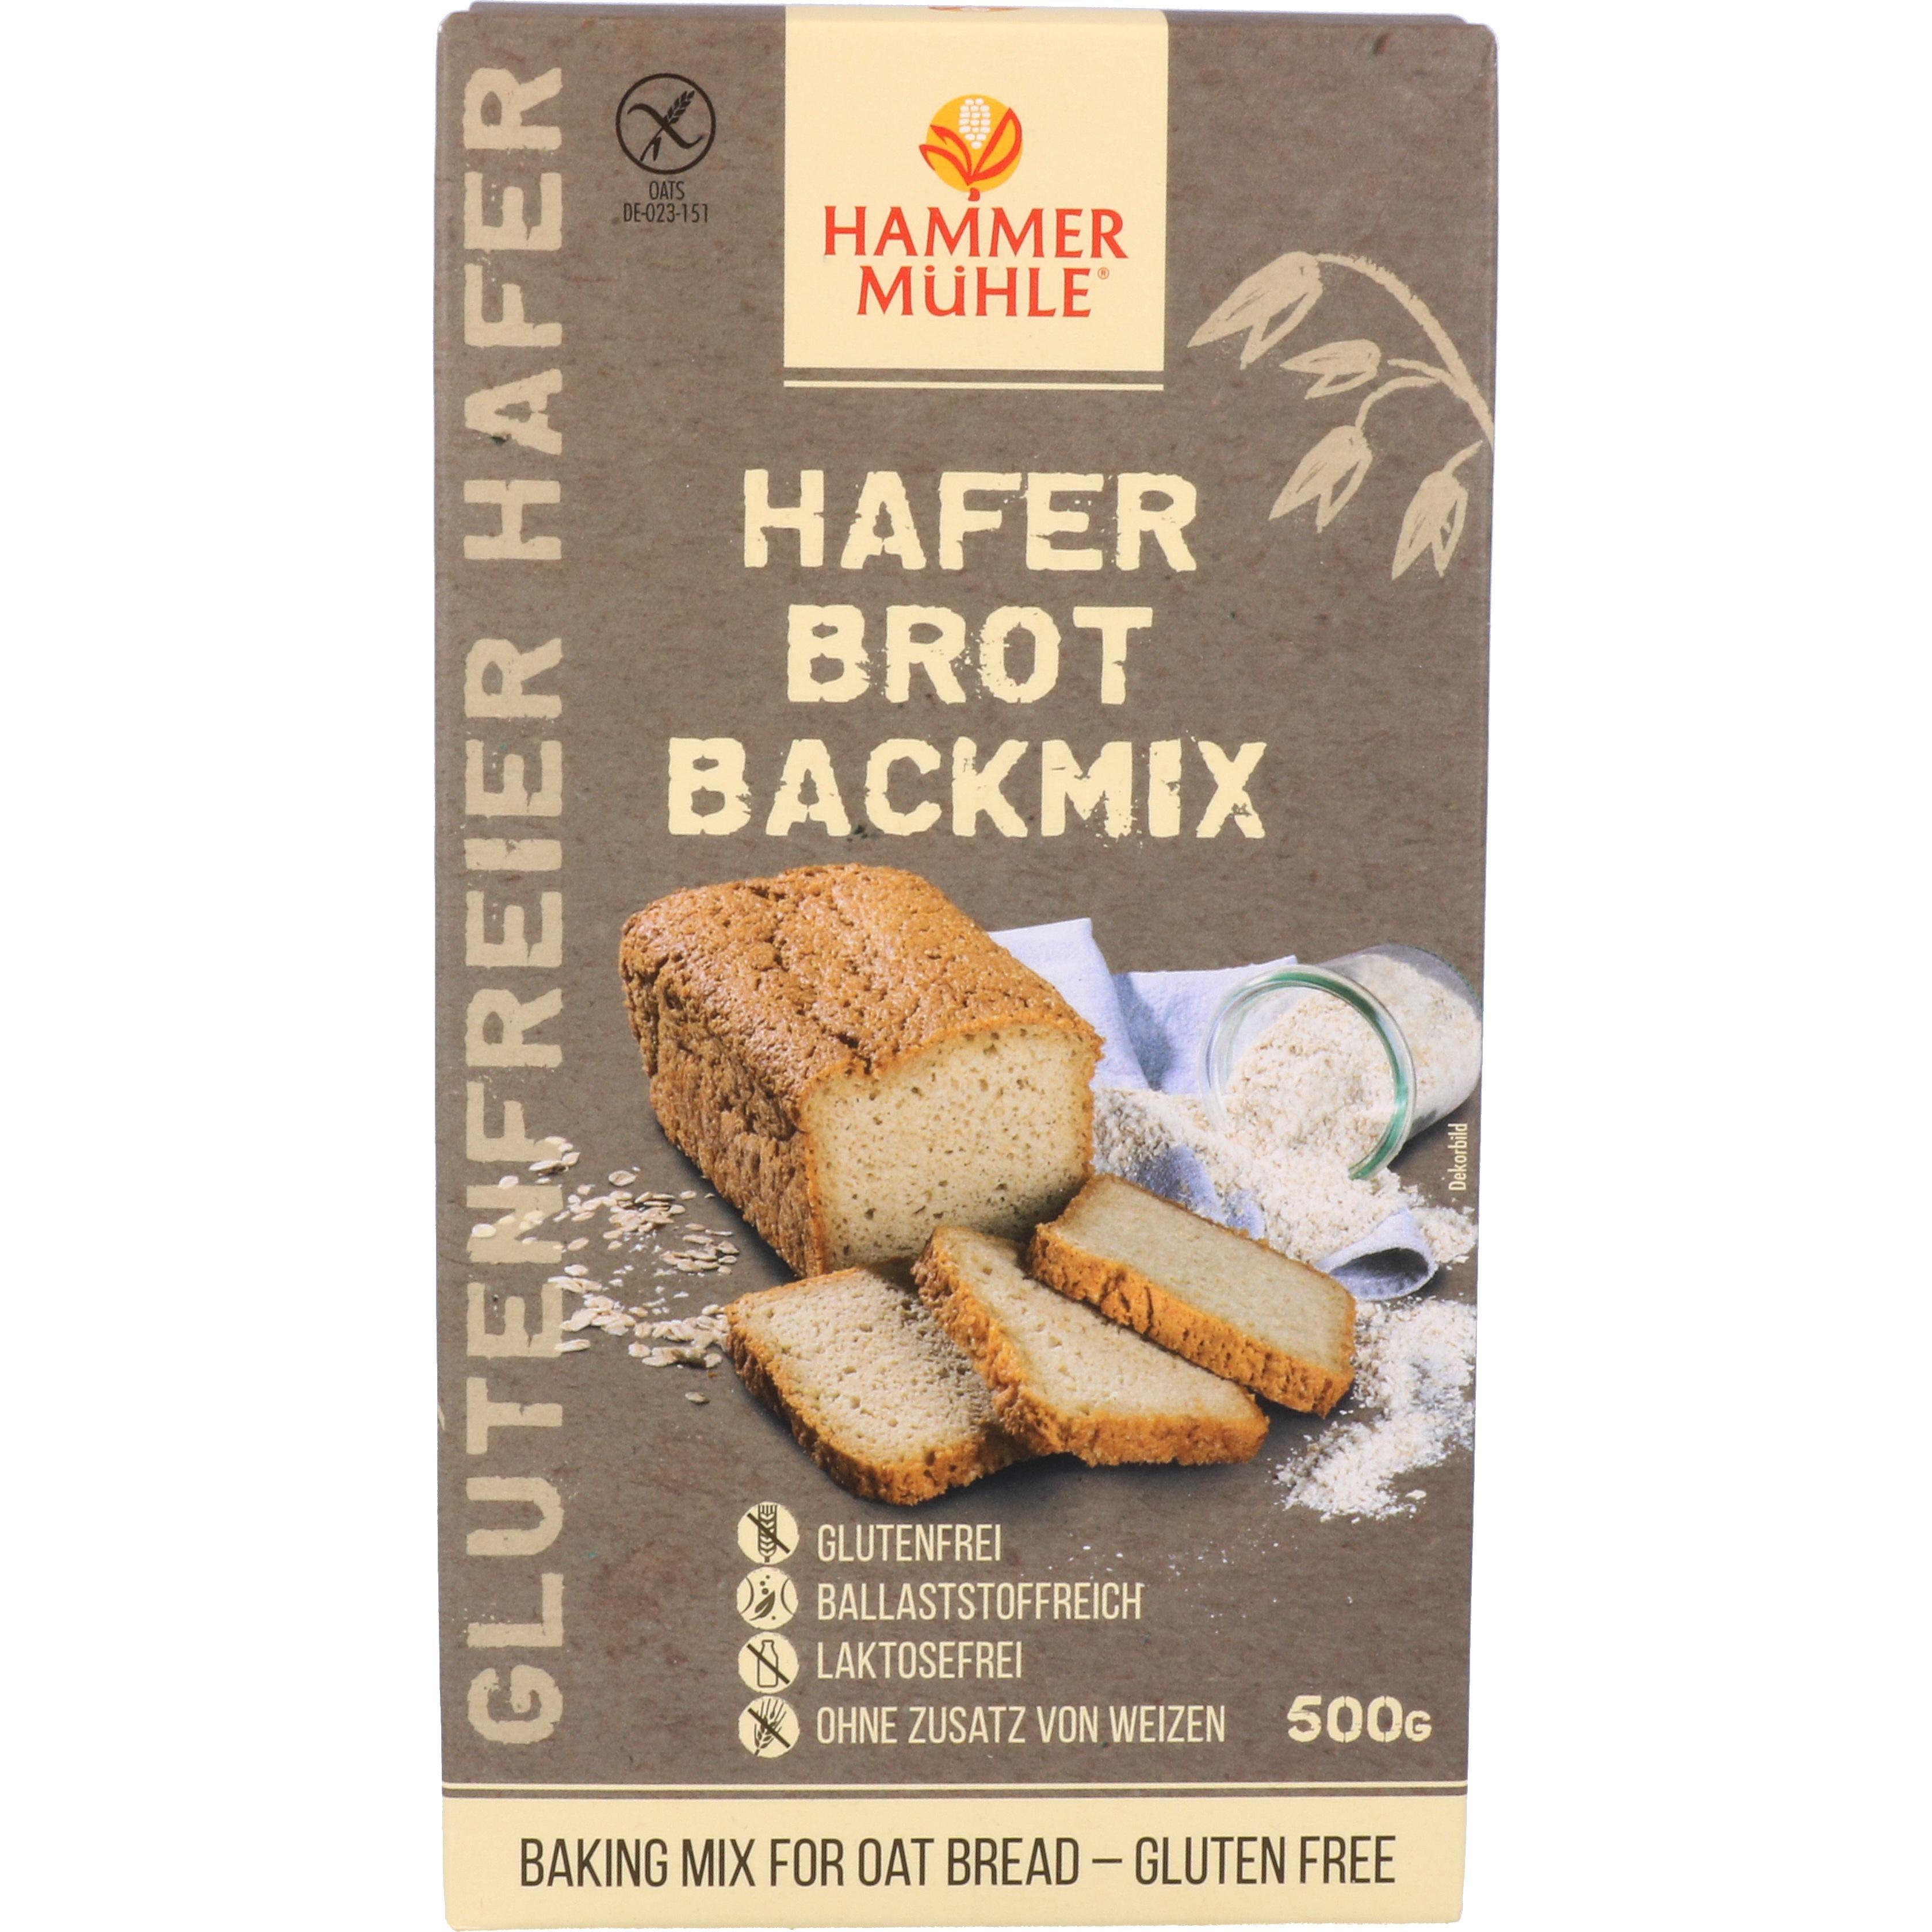 Hammermühle Hafer Brot Backmix 500g